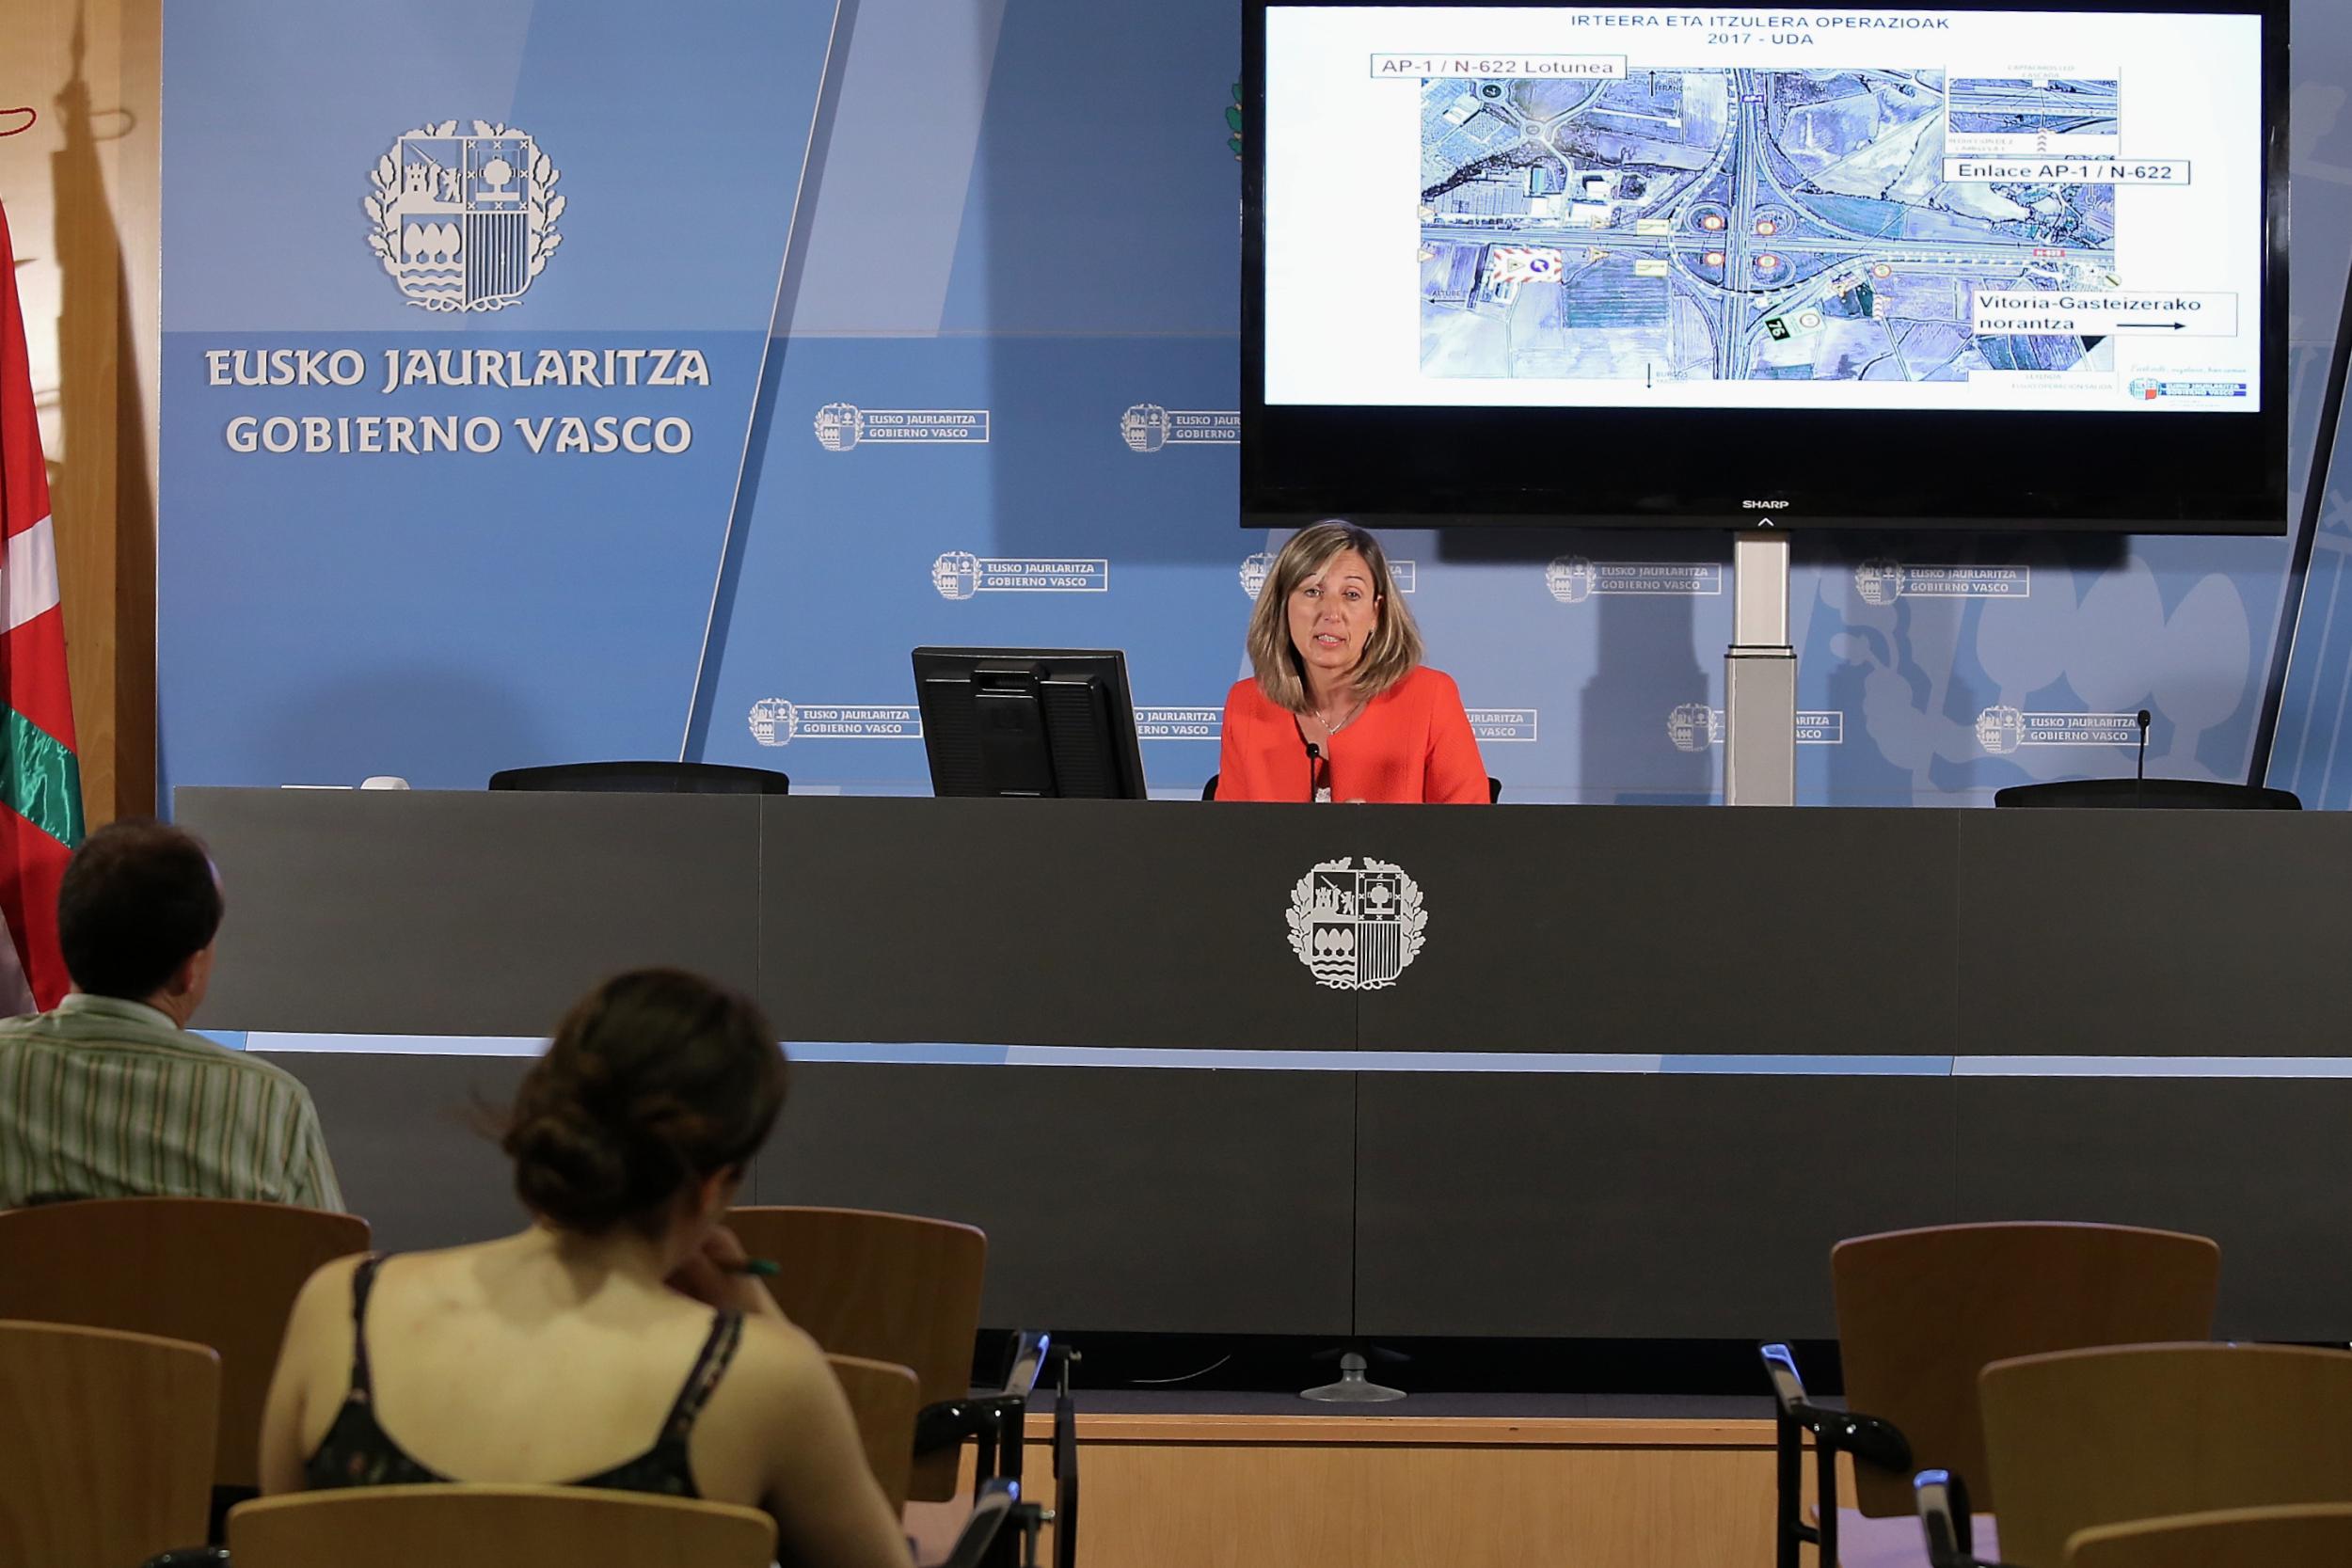 Irekia eusko jaurlaritza gobierno vasco la direcci n - Direccion de trafico en malaga ...